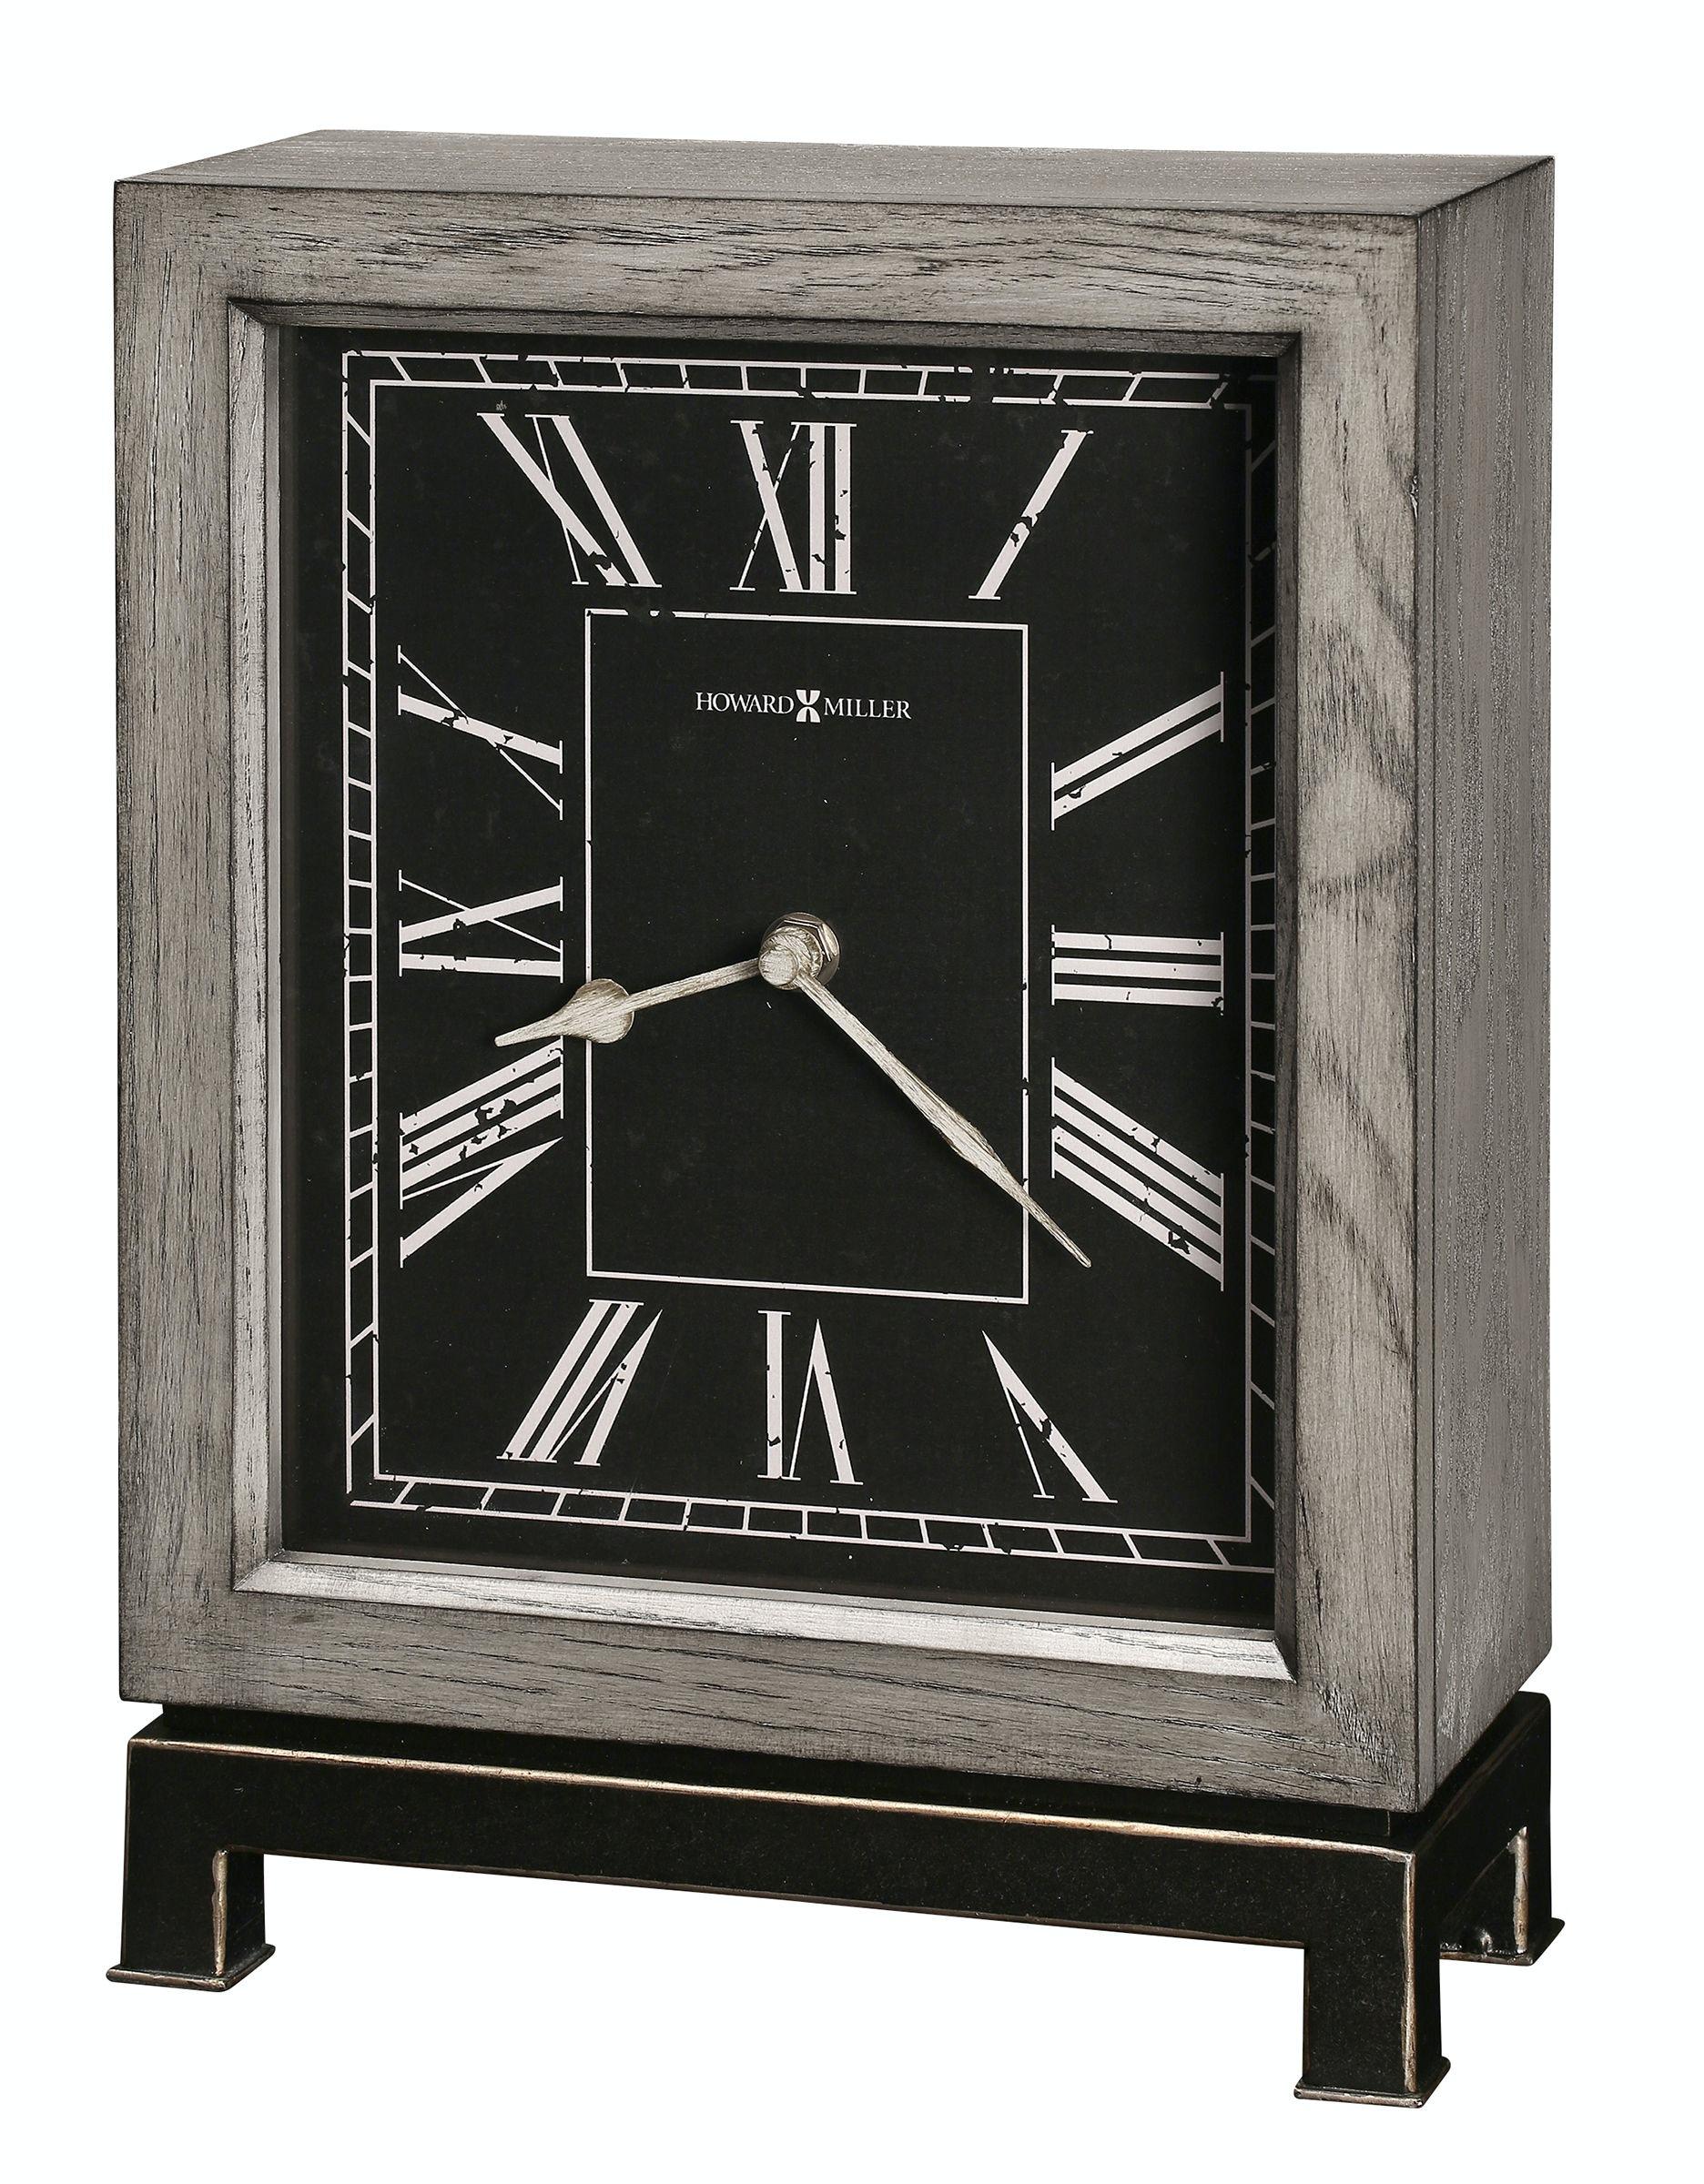 Howard Miller Accessories Merrick Clocks Mantel 635 189